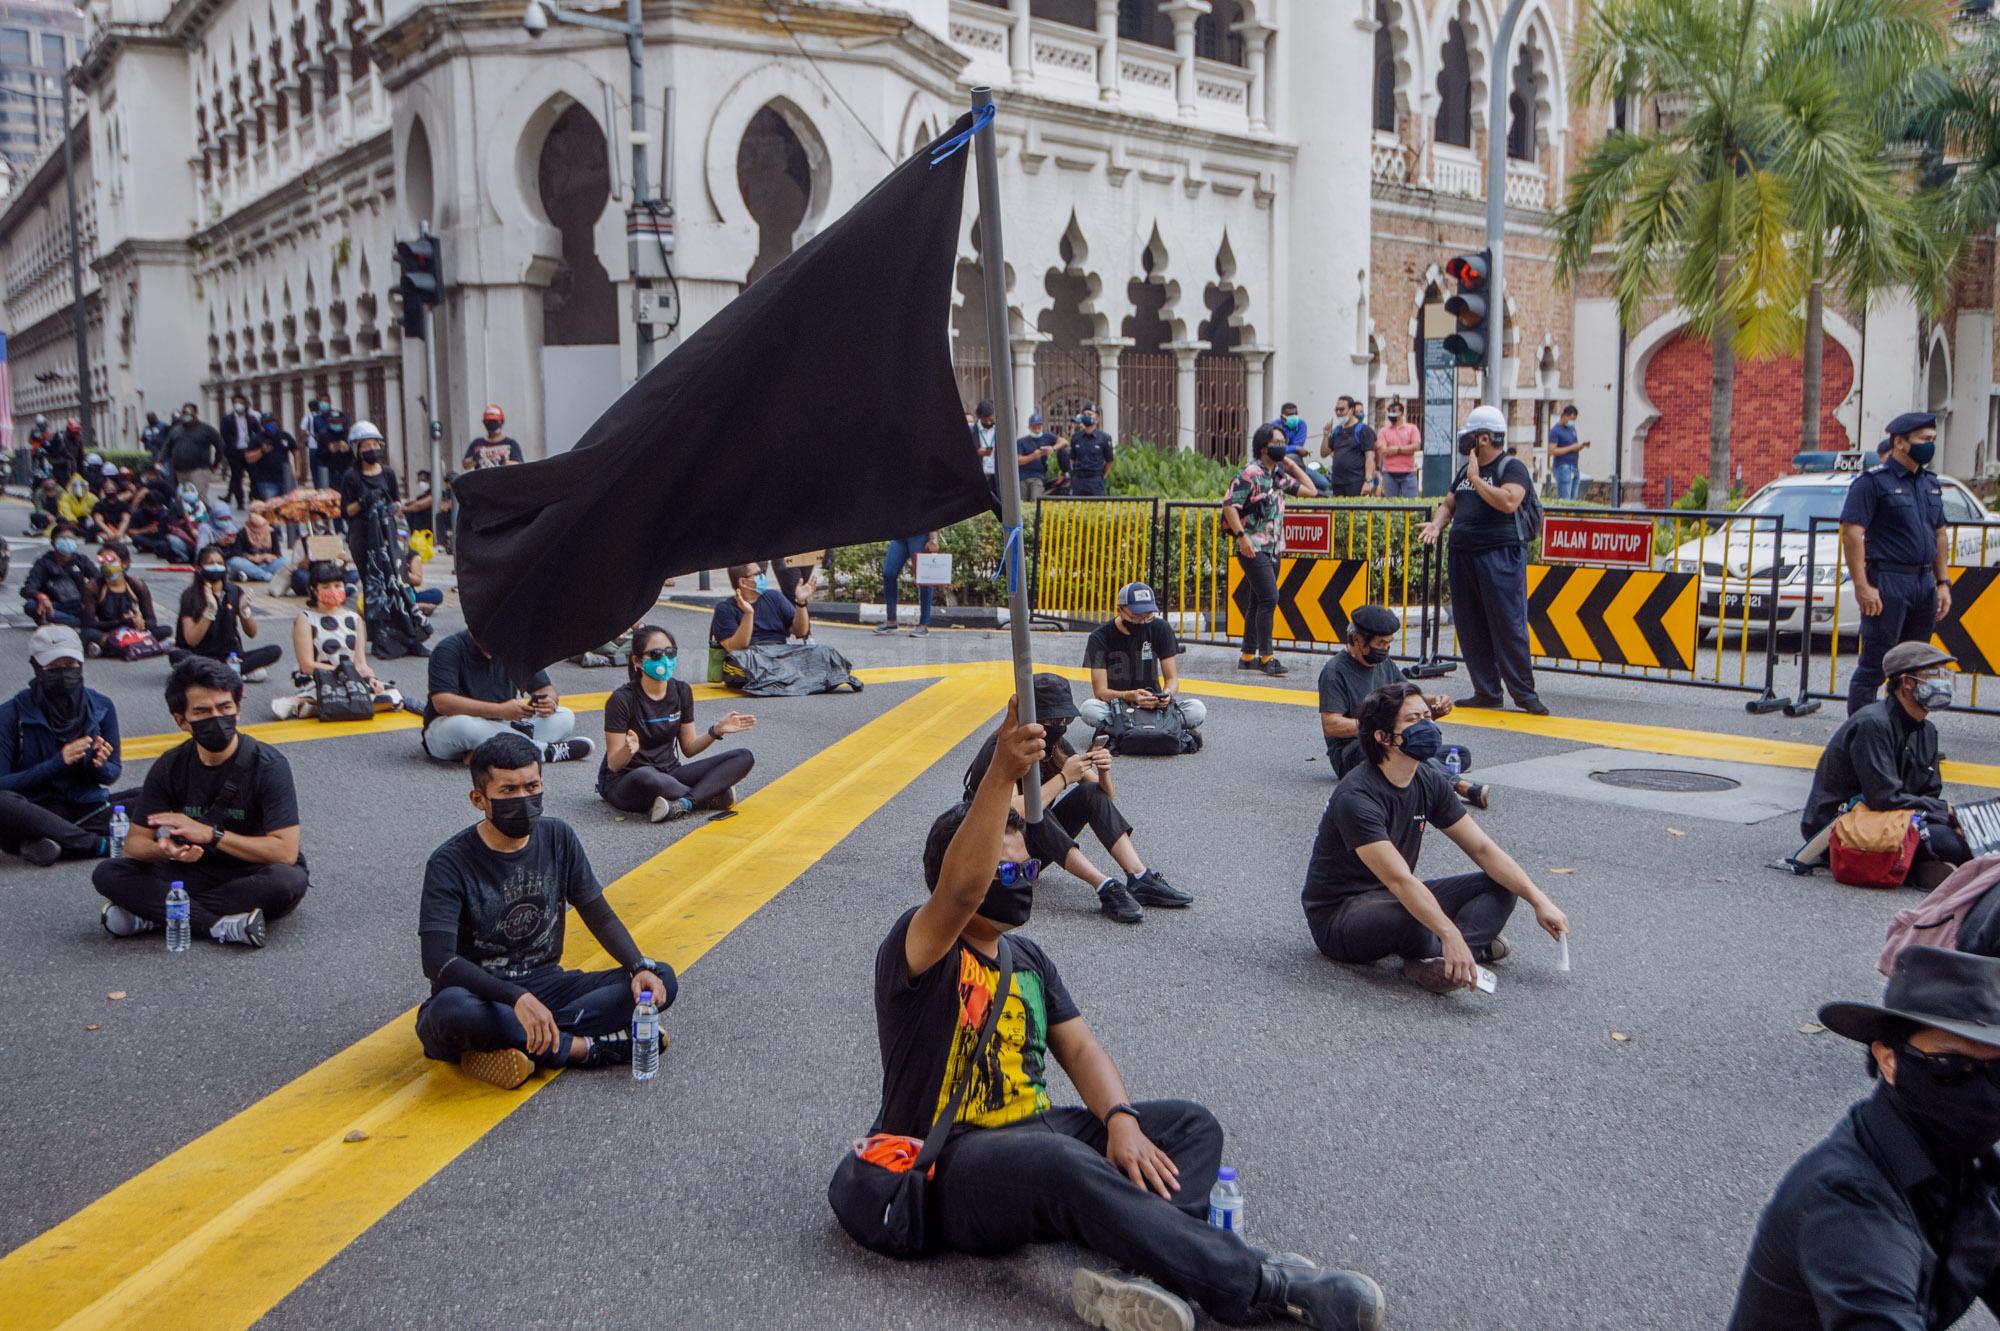 A crowd gathered near Dataran Merdeka during the #Lawan protest in Kuala Lumpur July 31, 2021. ― Picture by Shafwan Zaidon